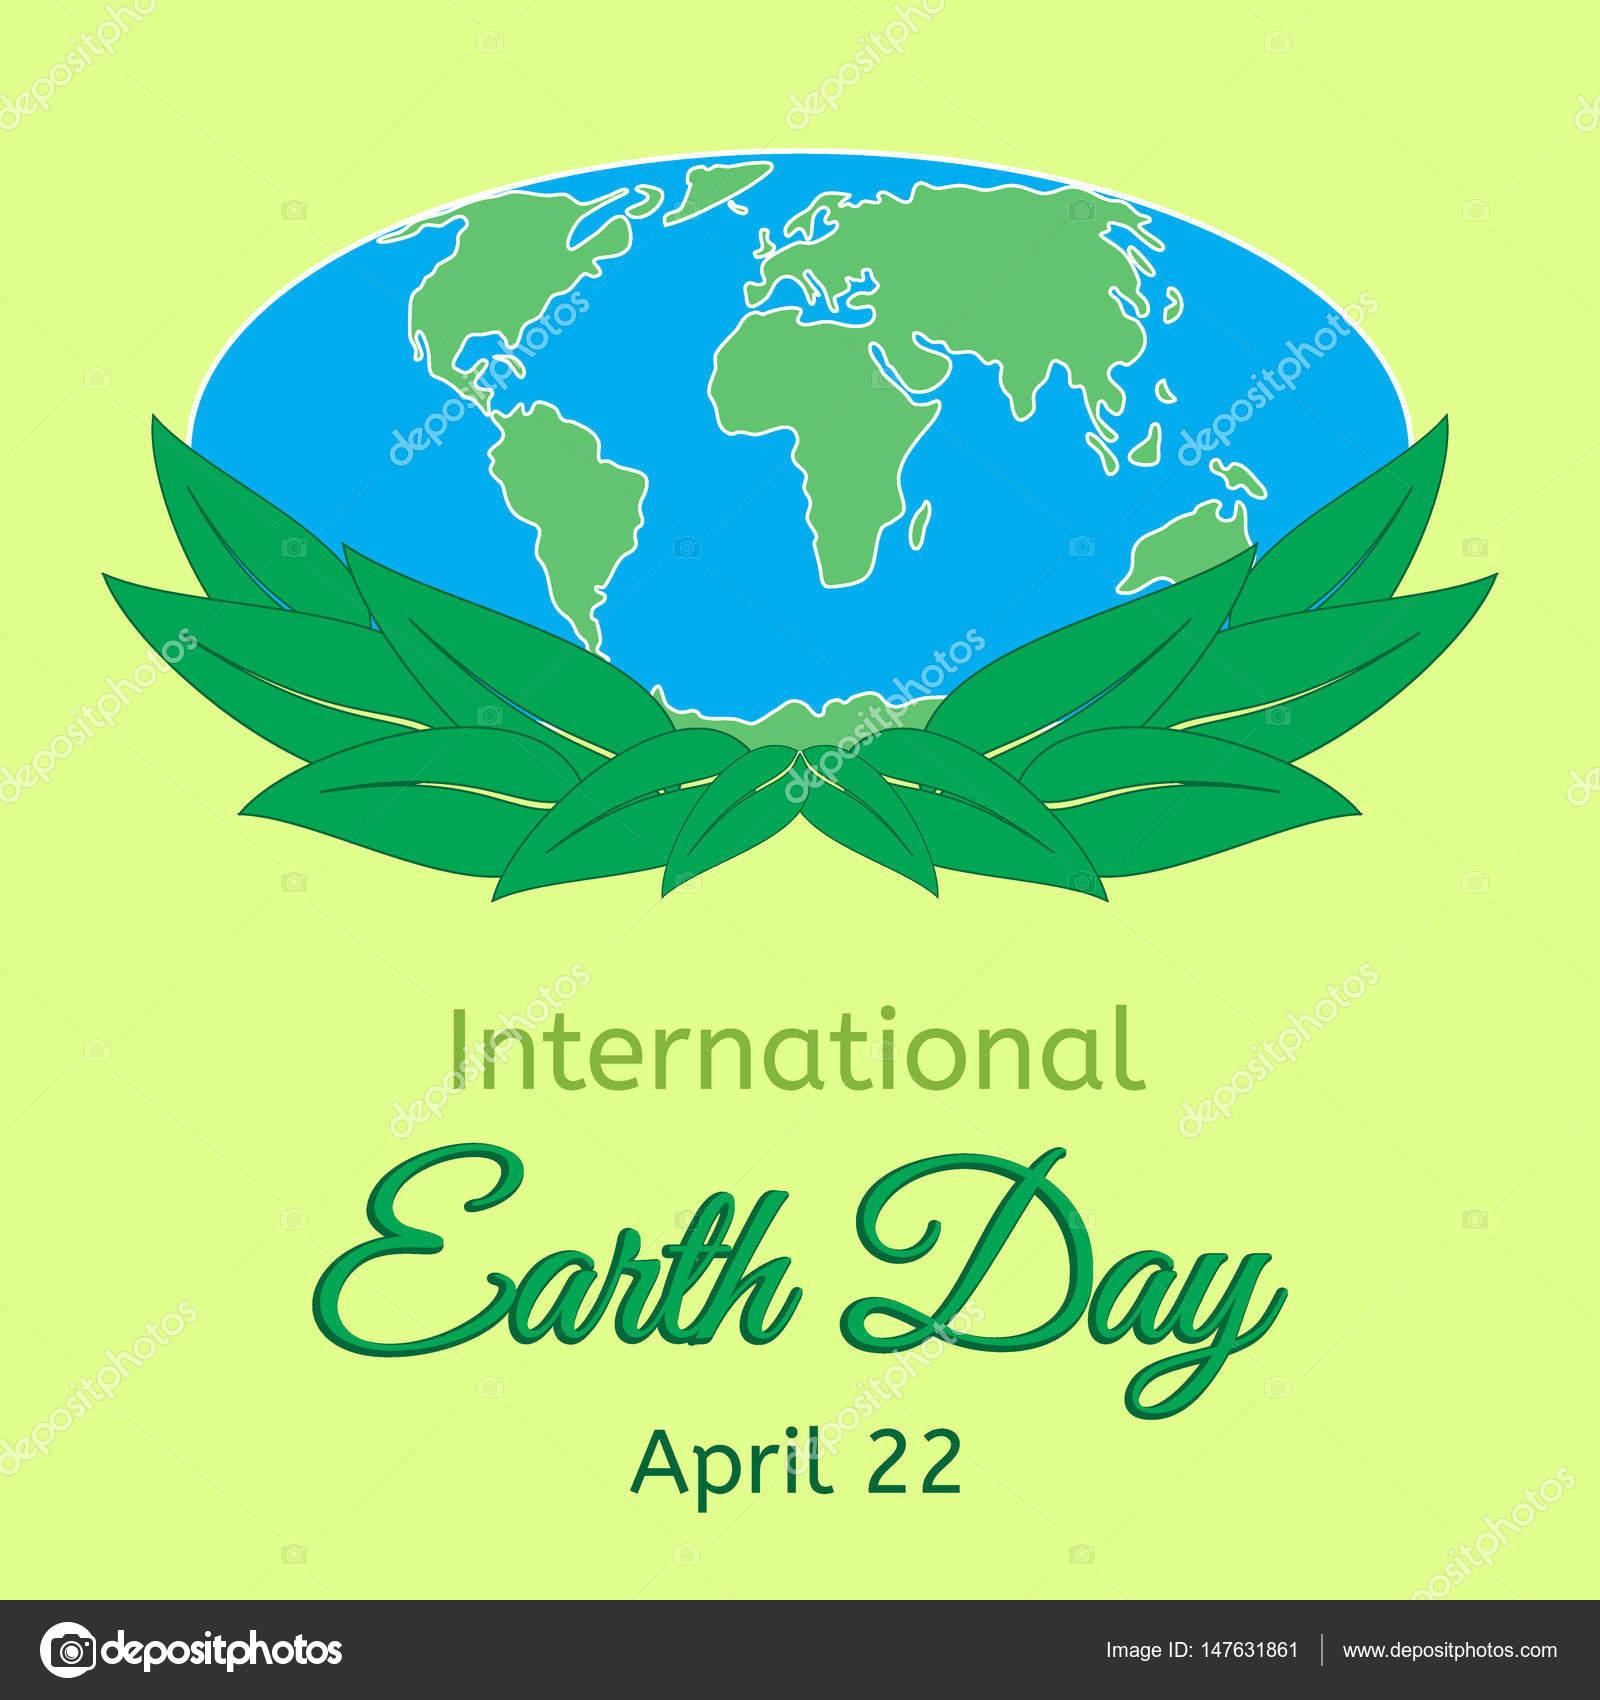 International mother earth day theme globe and green leaves as a international mother earth day theme globe and green leaves as a symbol of environmental and buycottarizona